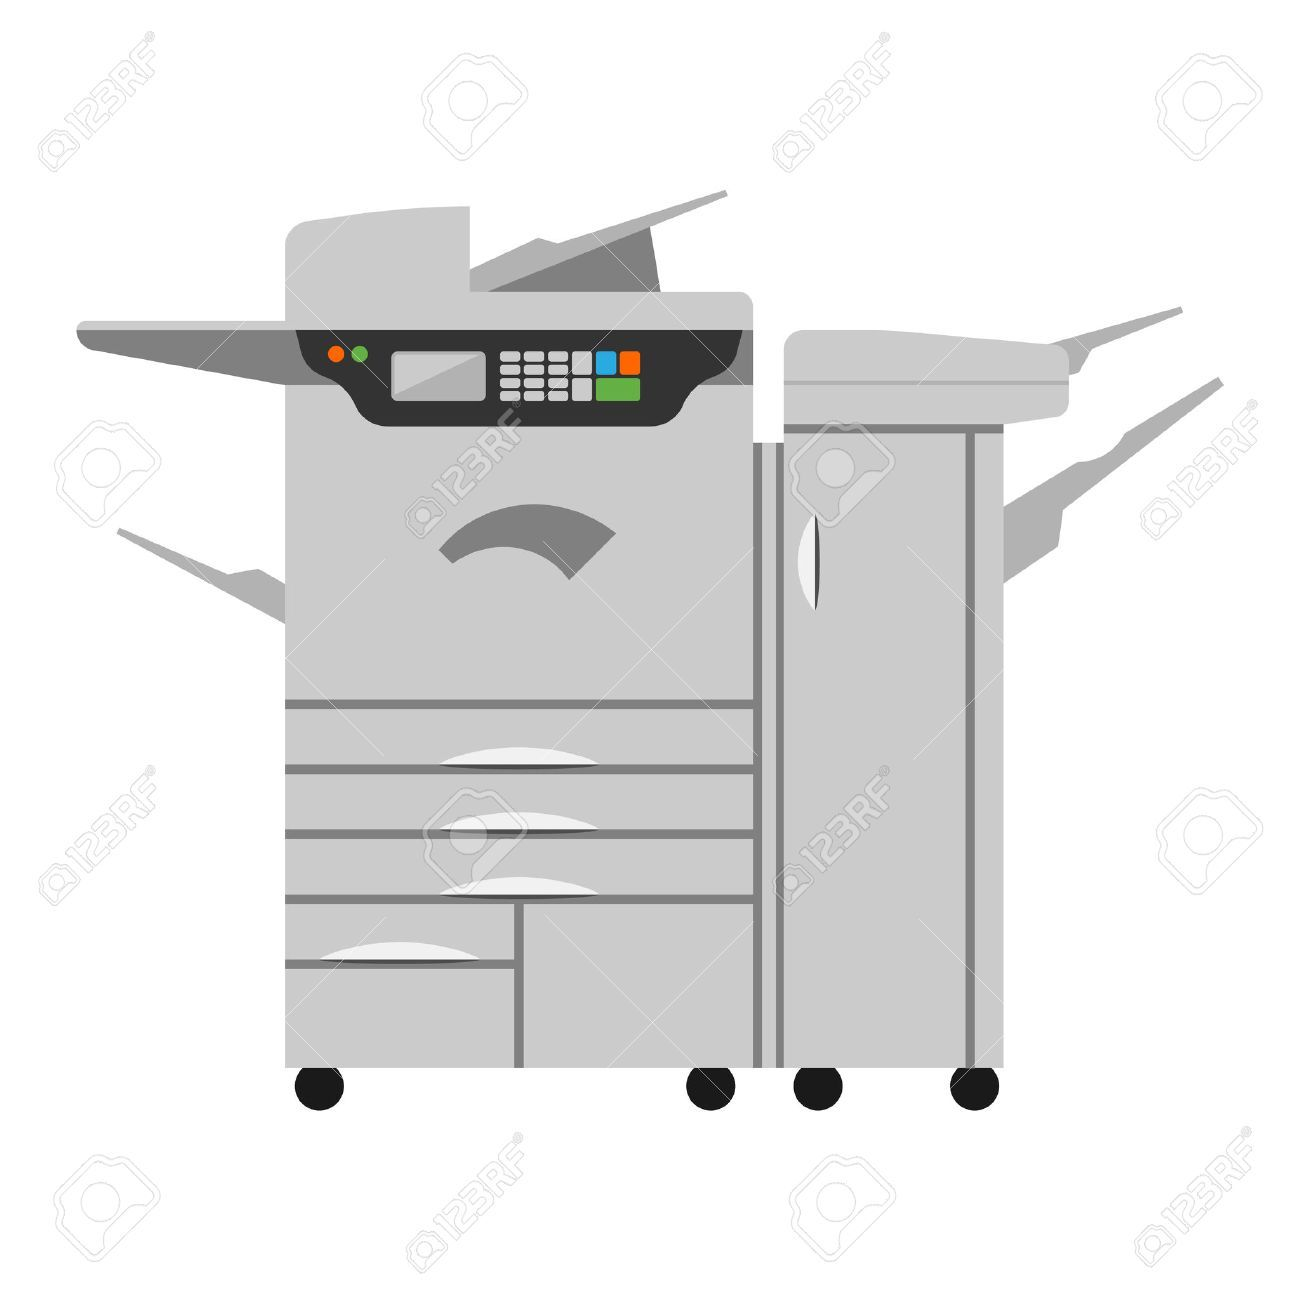 Photostat machine clipart banner free Photocopy machine clipart 7 » Clipart Portal banner free